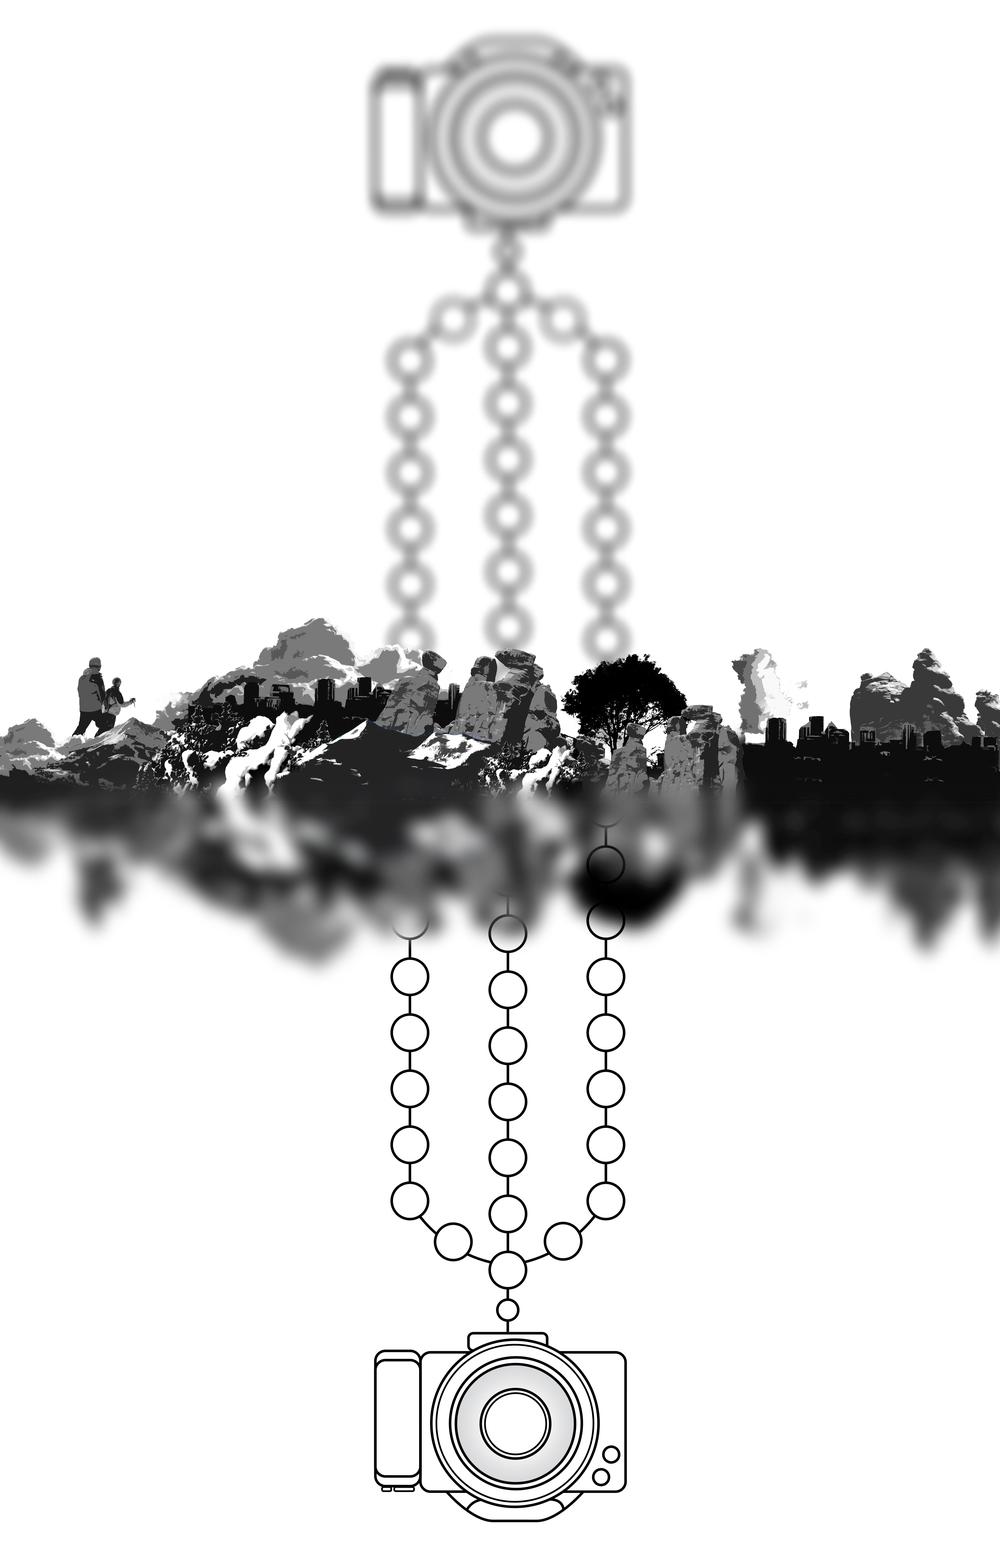 tripodsymmetryshadow.jpg